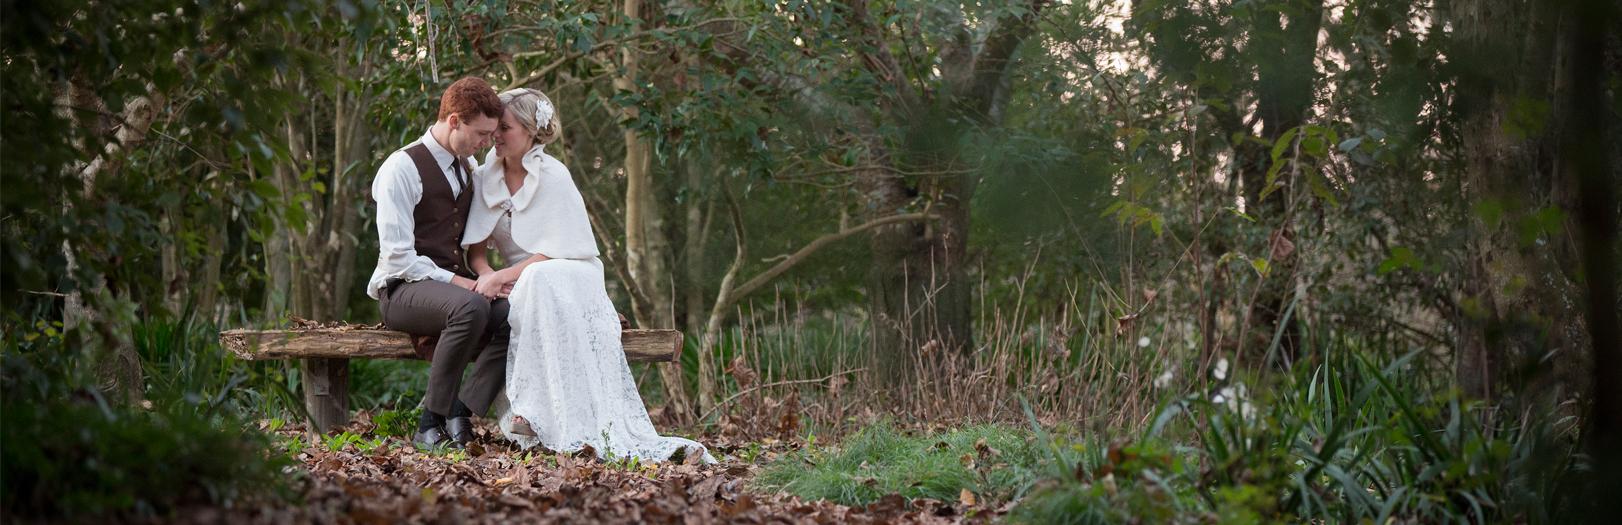 The-Old-Church-Eva-Bradley-Photography-wedding-venues